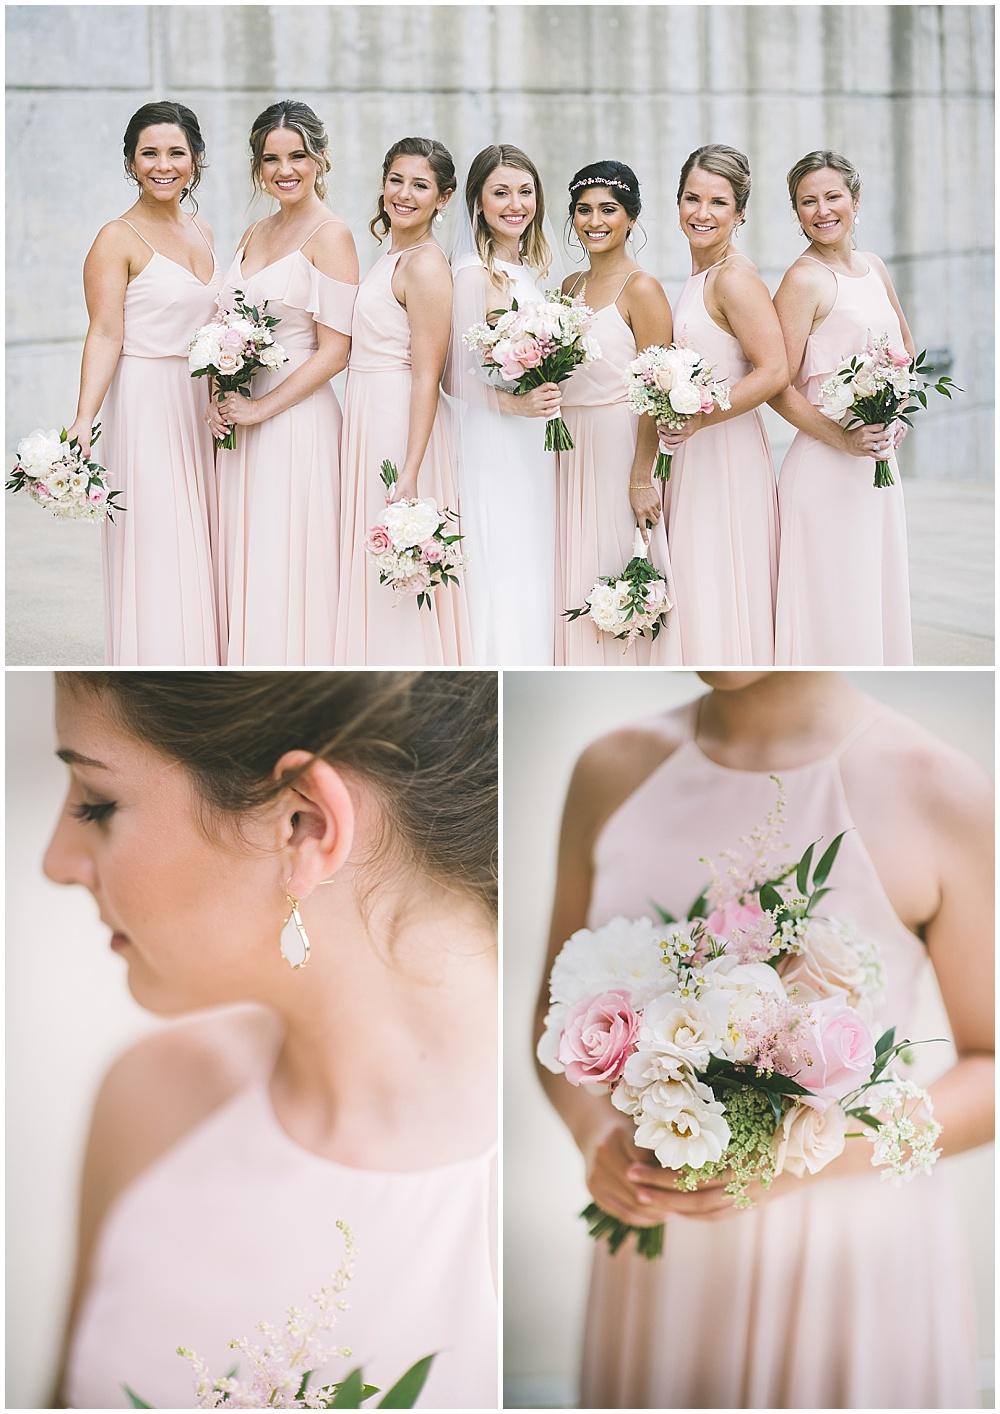 A garden-inspired Purdue University wedding | Purdue alumni wedding, shively club wedding, boilermaker wedding, blush wedding, blush bridesmaid dresses